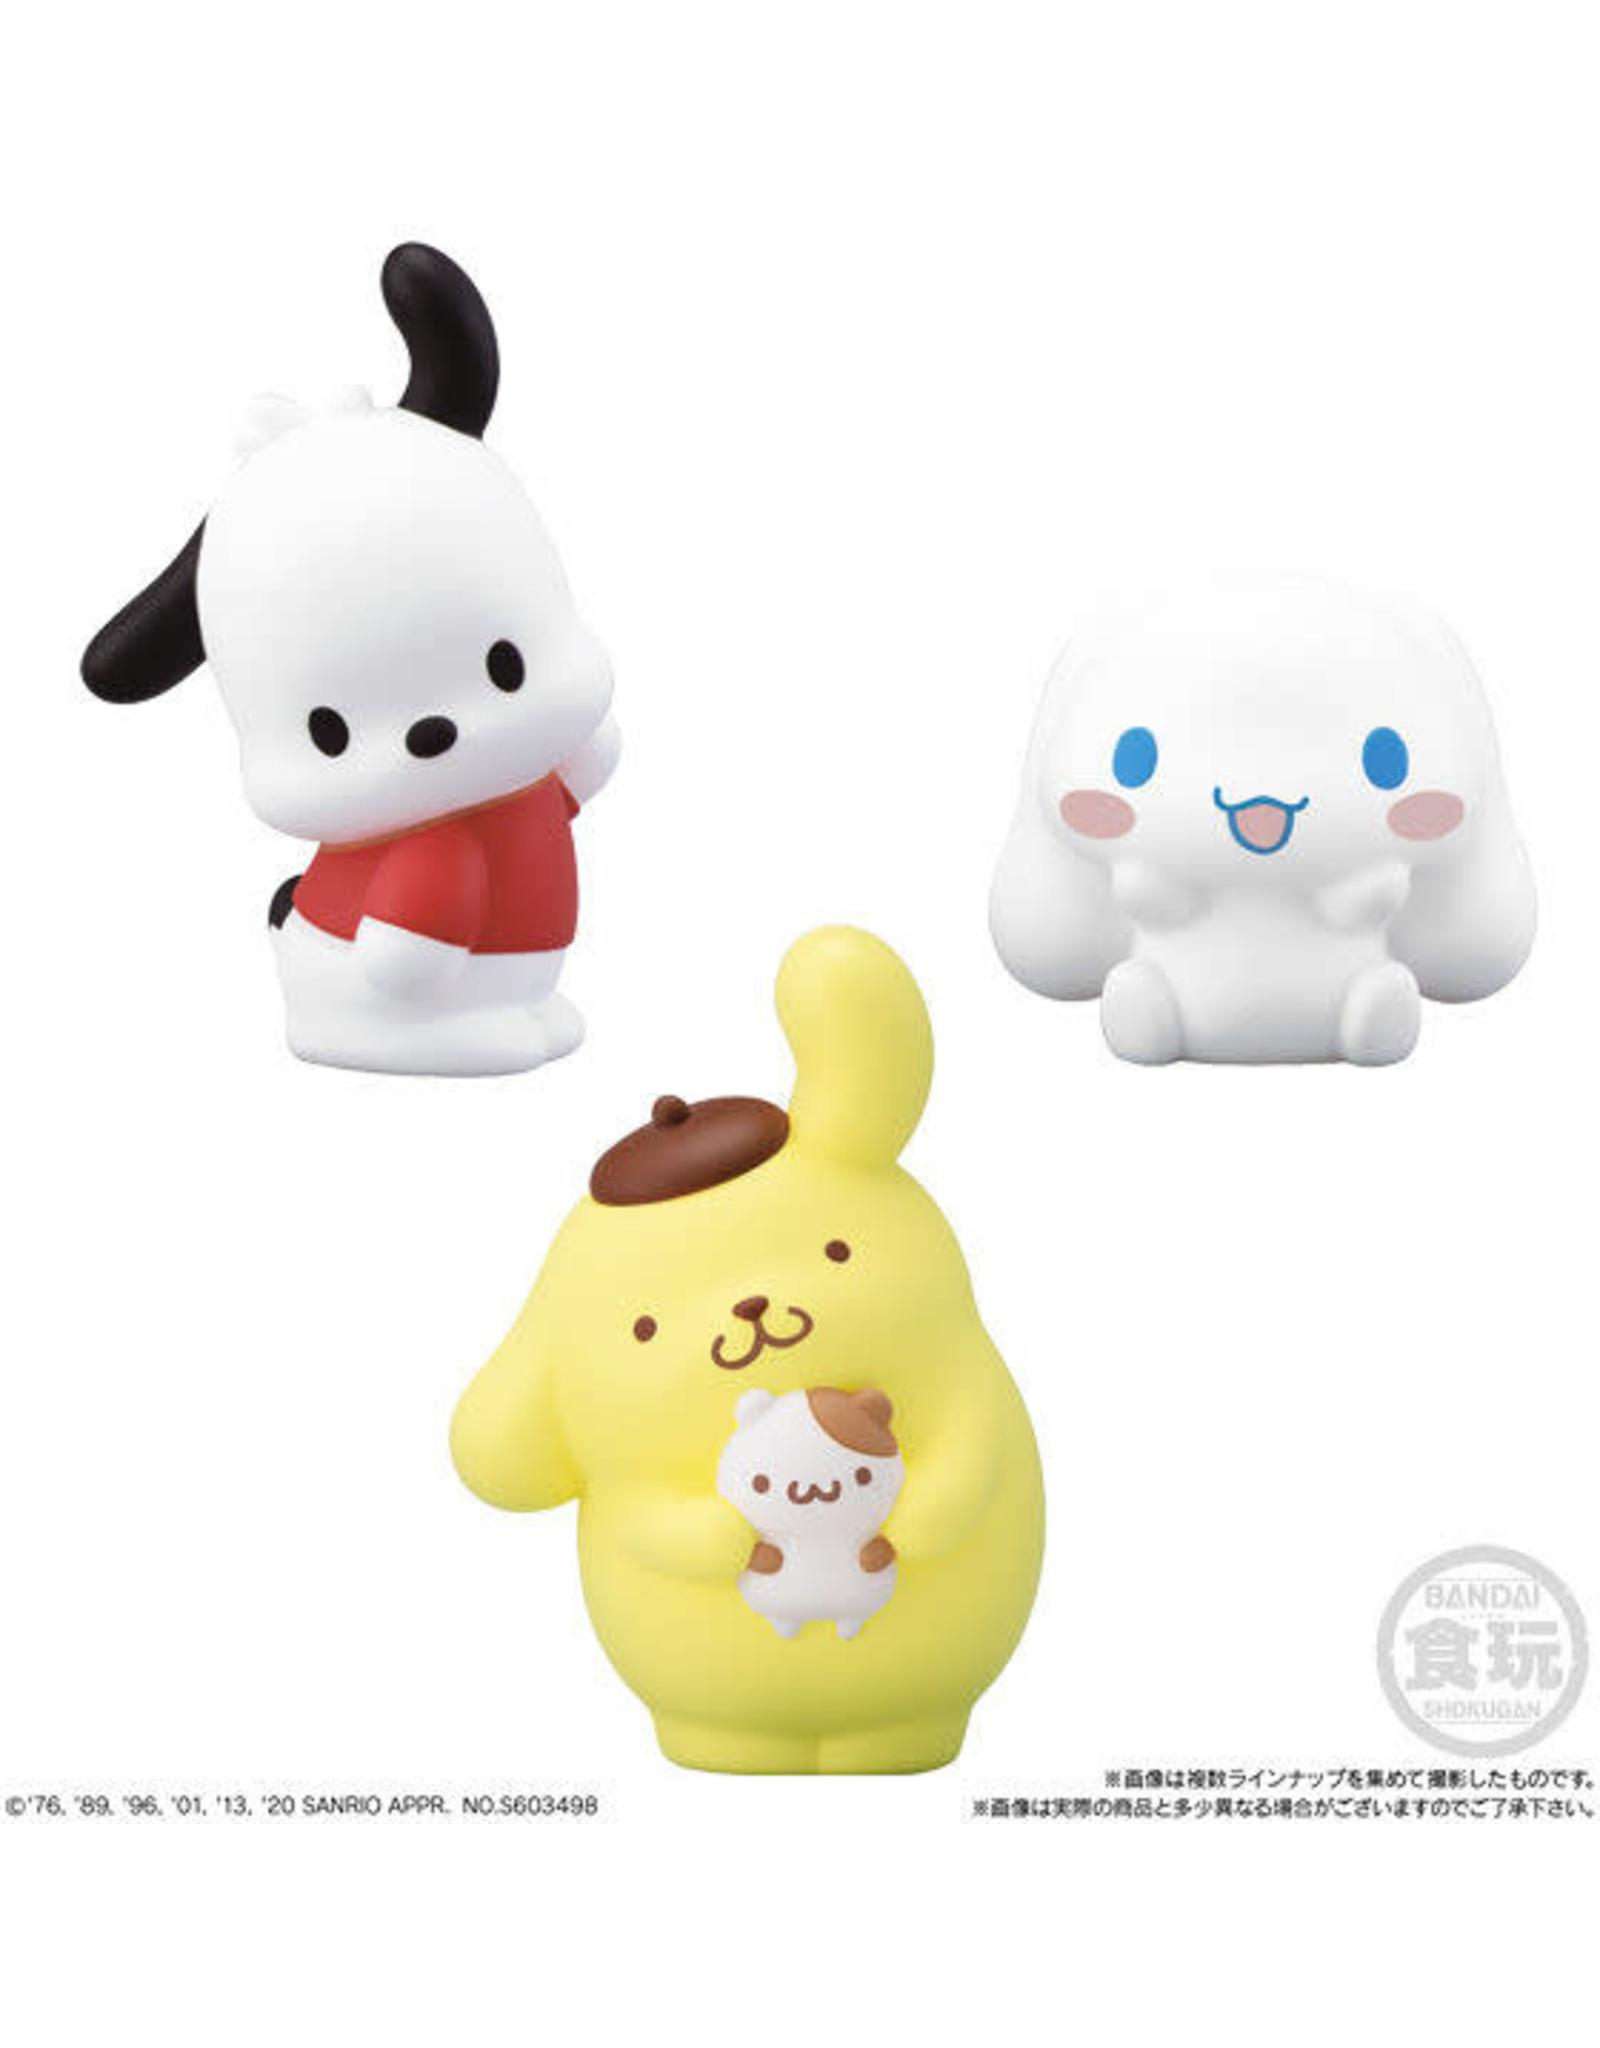 Sanrio Characters Friends - Kauwgom + Collectible Mini Figure